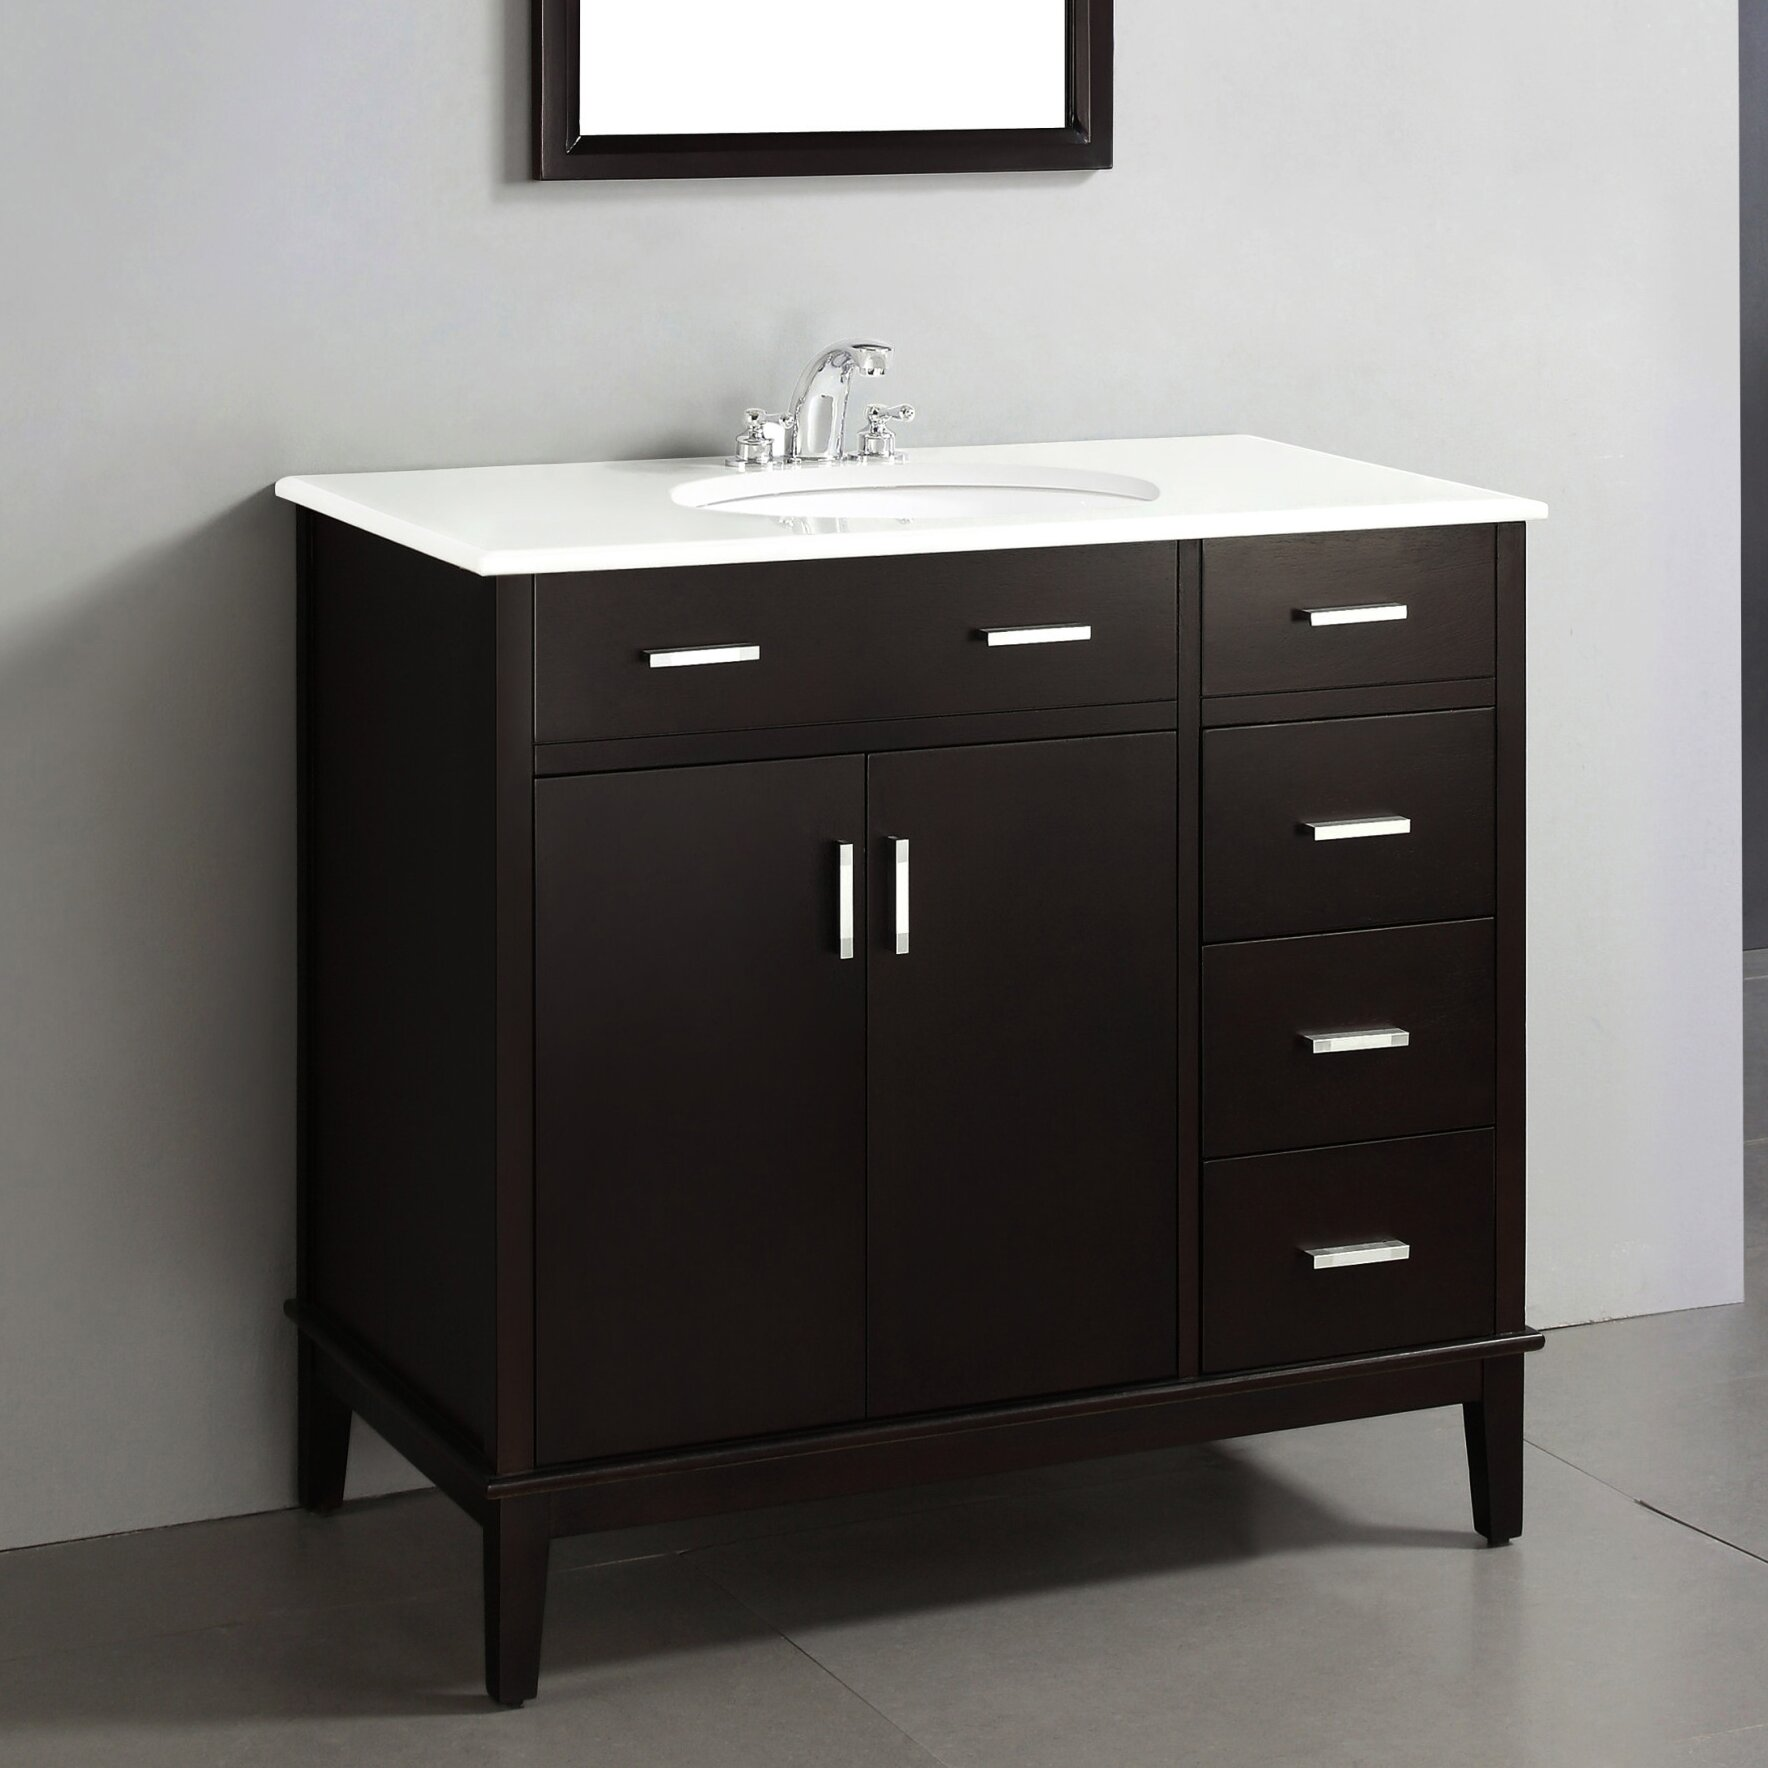 "Simpli Home Urban Loft 36"" Single Bathroom Vanity Set & Reviews"